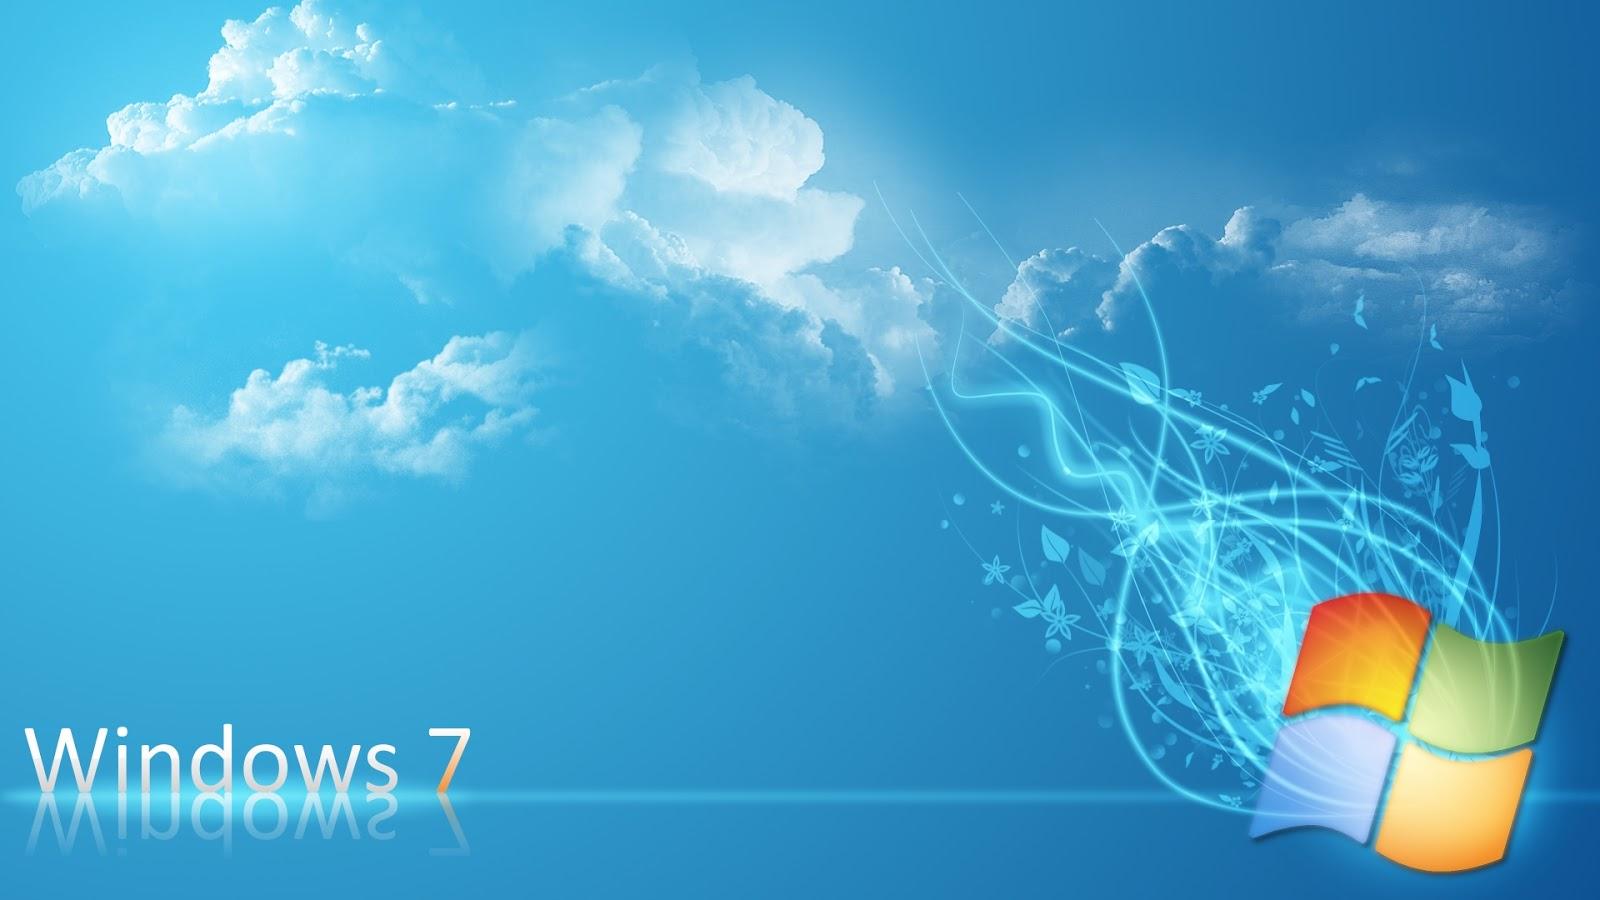 Wallpaper Download Top 10 Microsoft Windows 7 wallpaper HD 1600x900